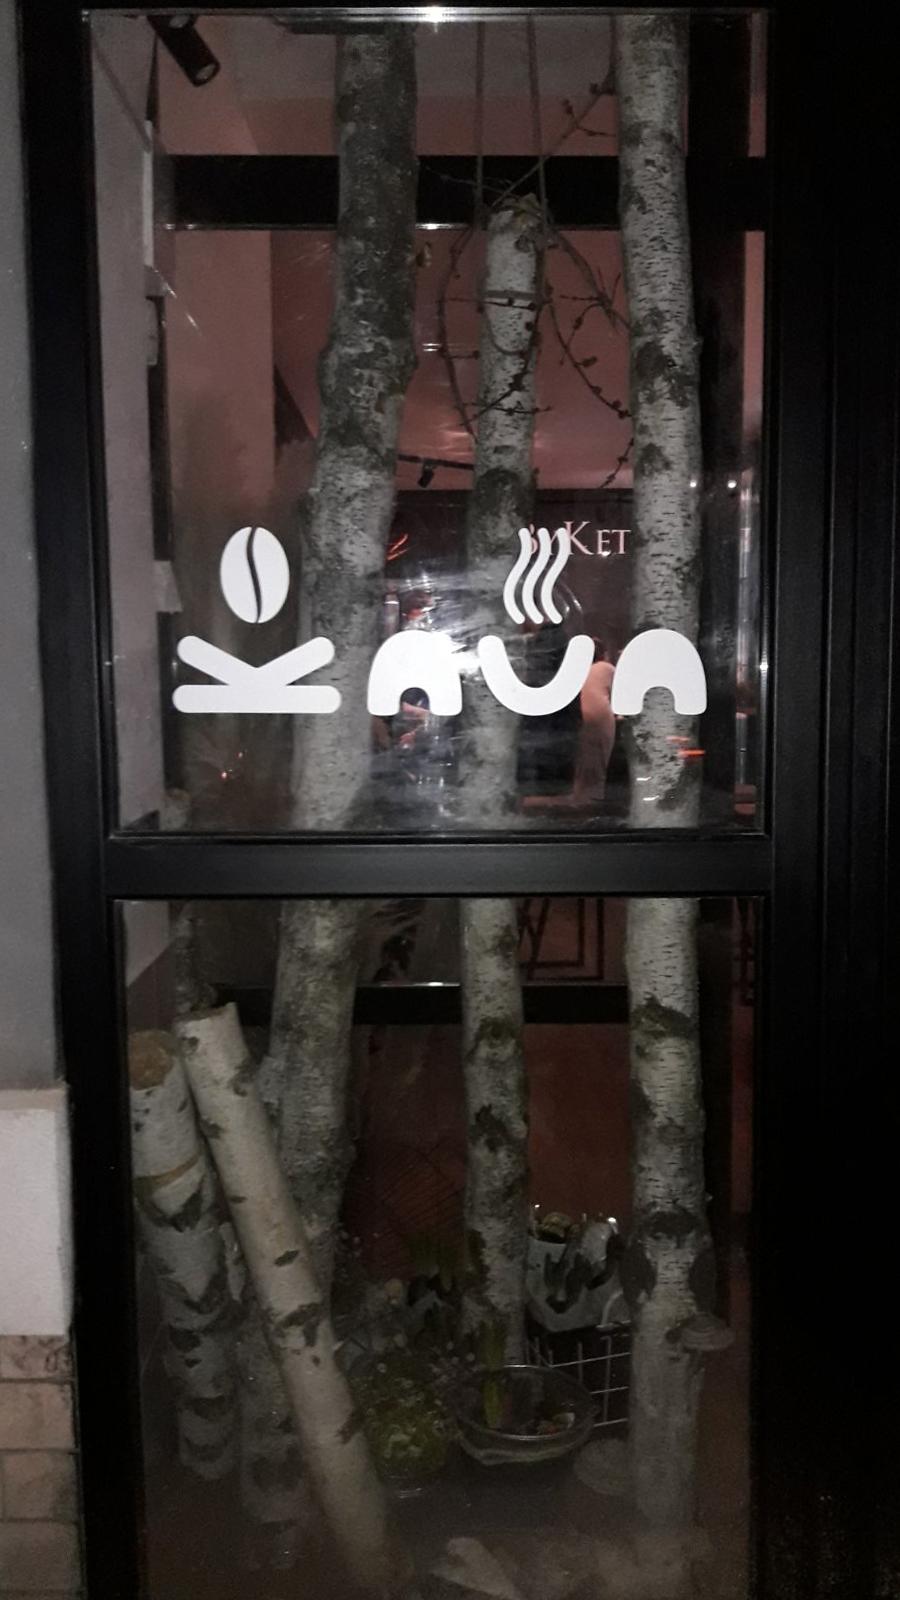 Самоклеющаяся пленка на окнах